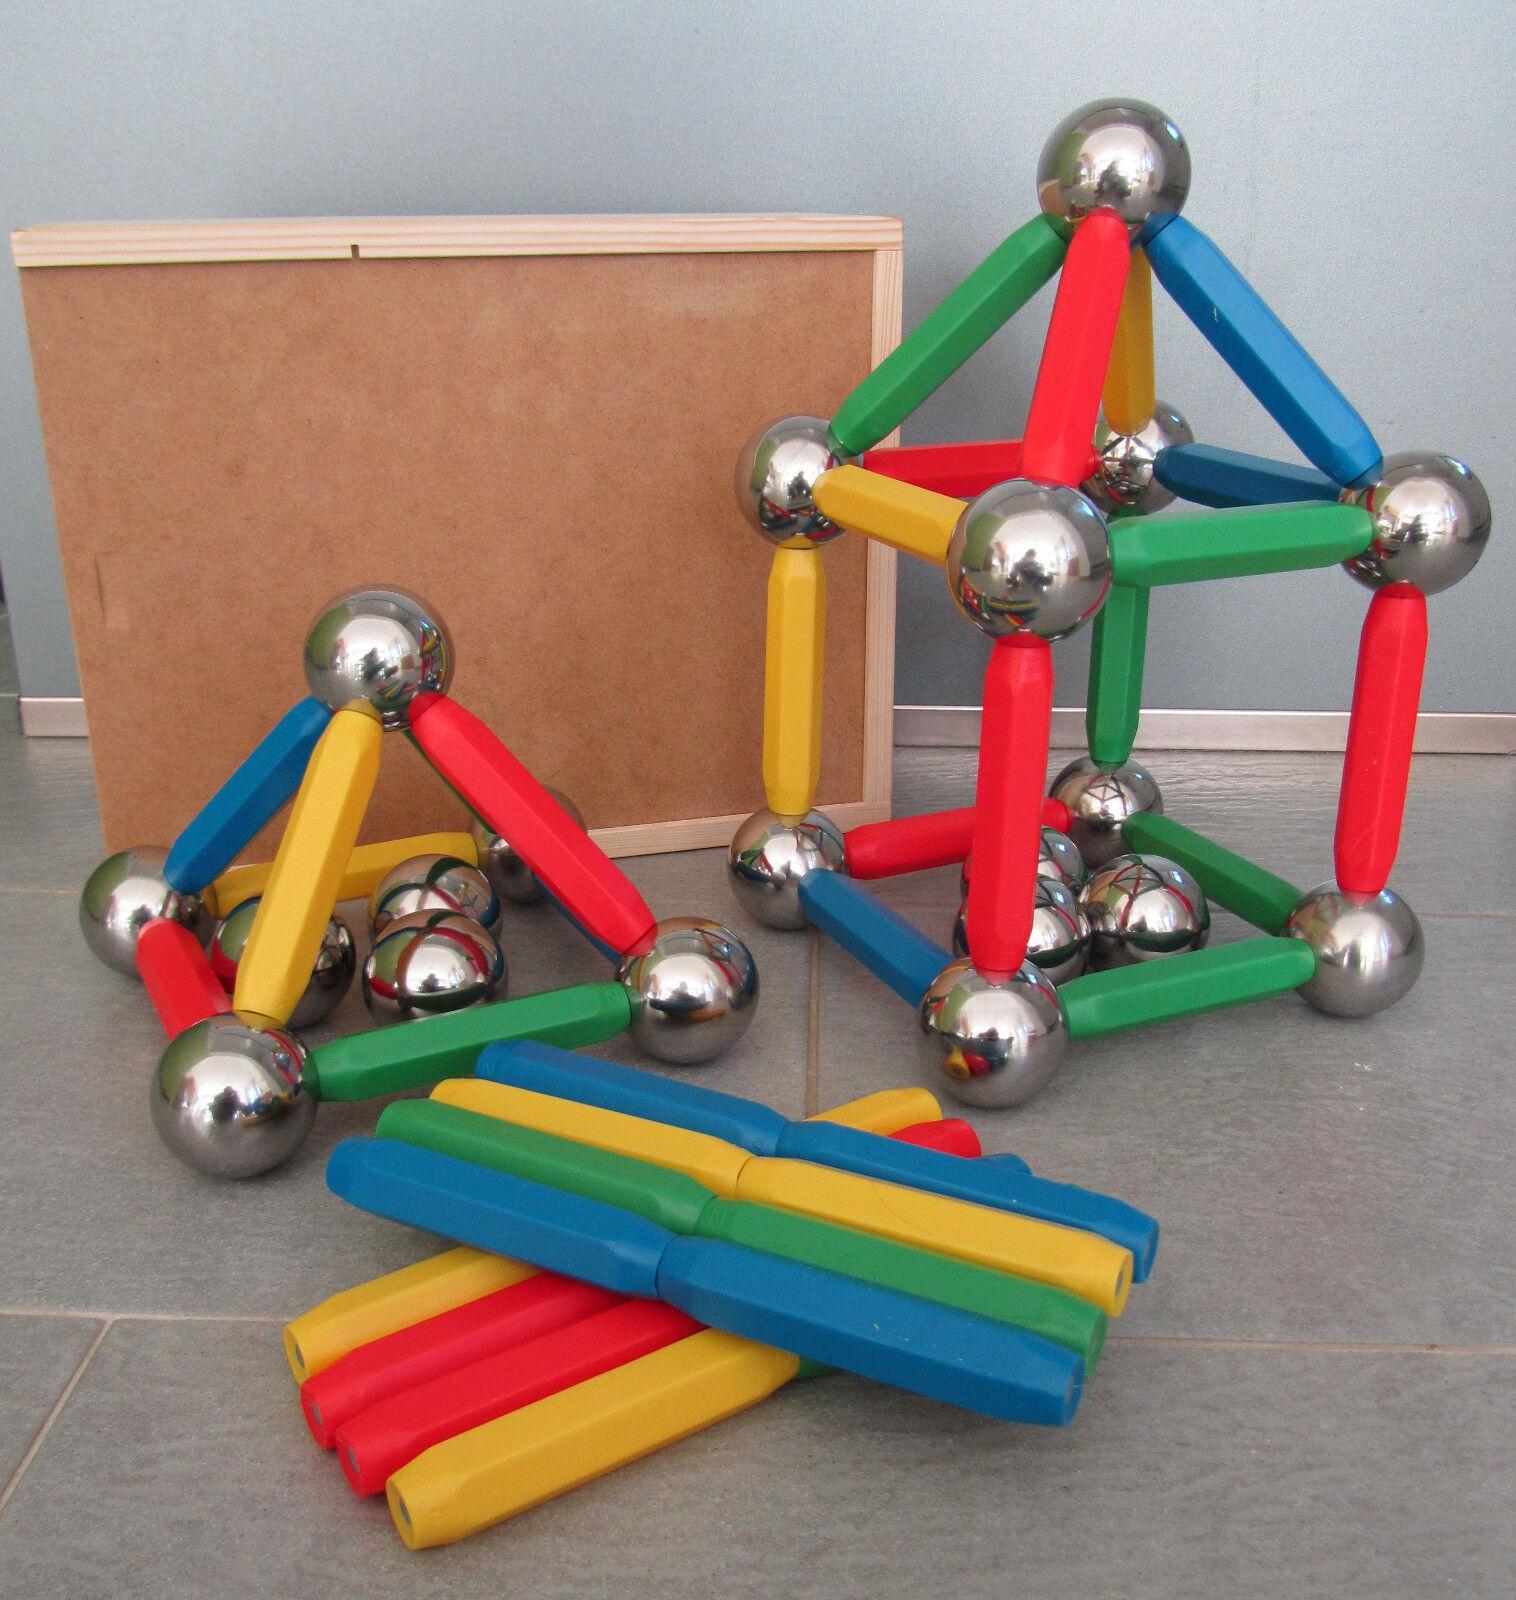 Magnetico XXL Magnetkugeln Magnetspiel 120 teilig